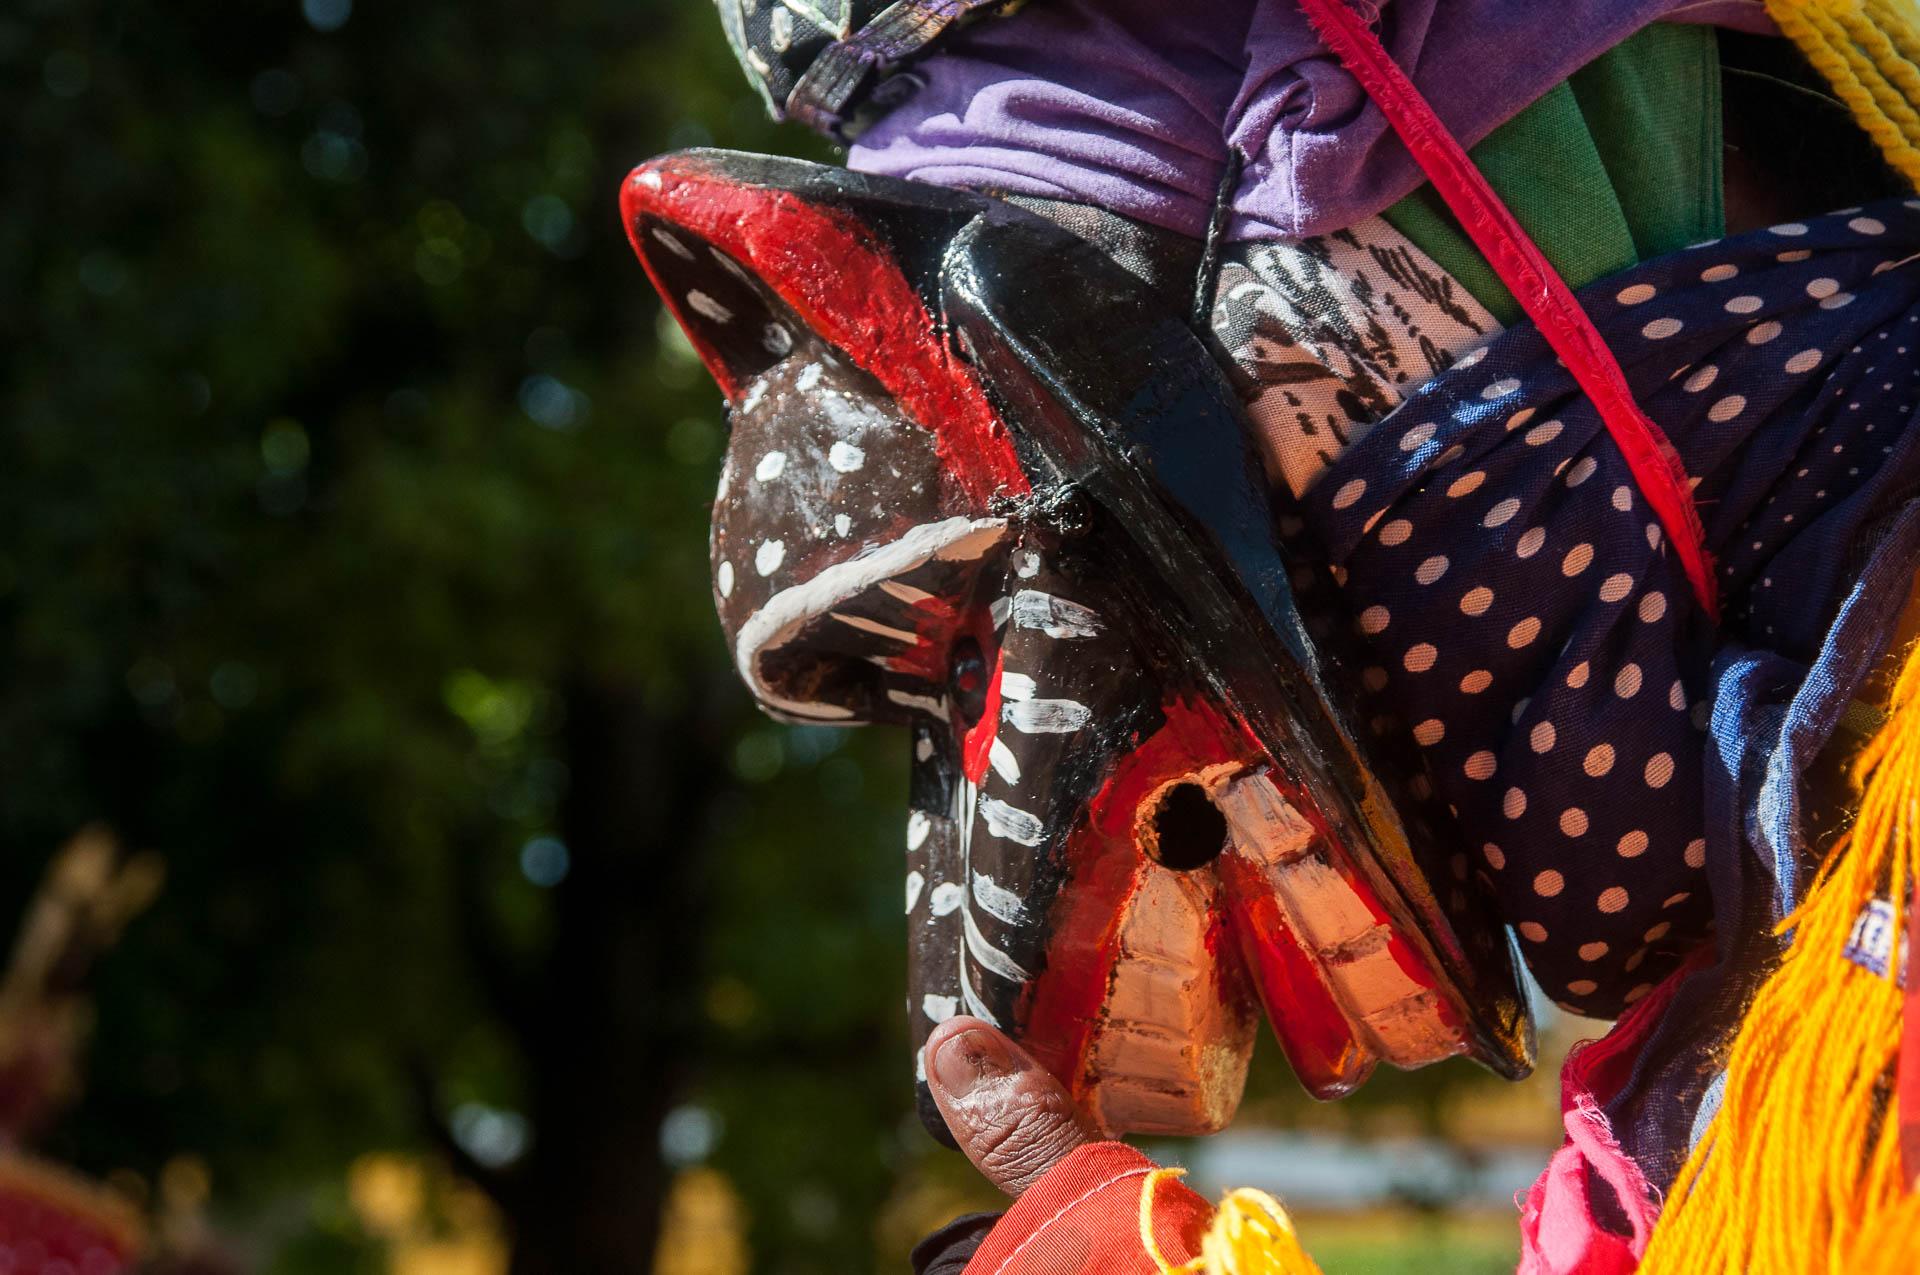 coban masque singe 1 - Les globe blogueurs - blog voyage nature